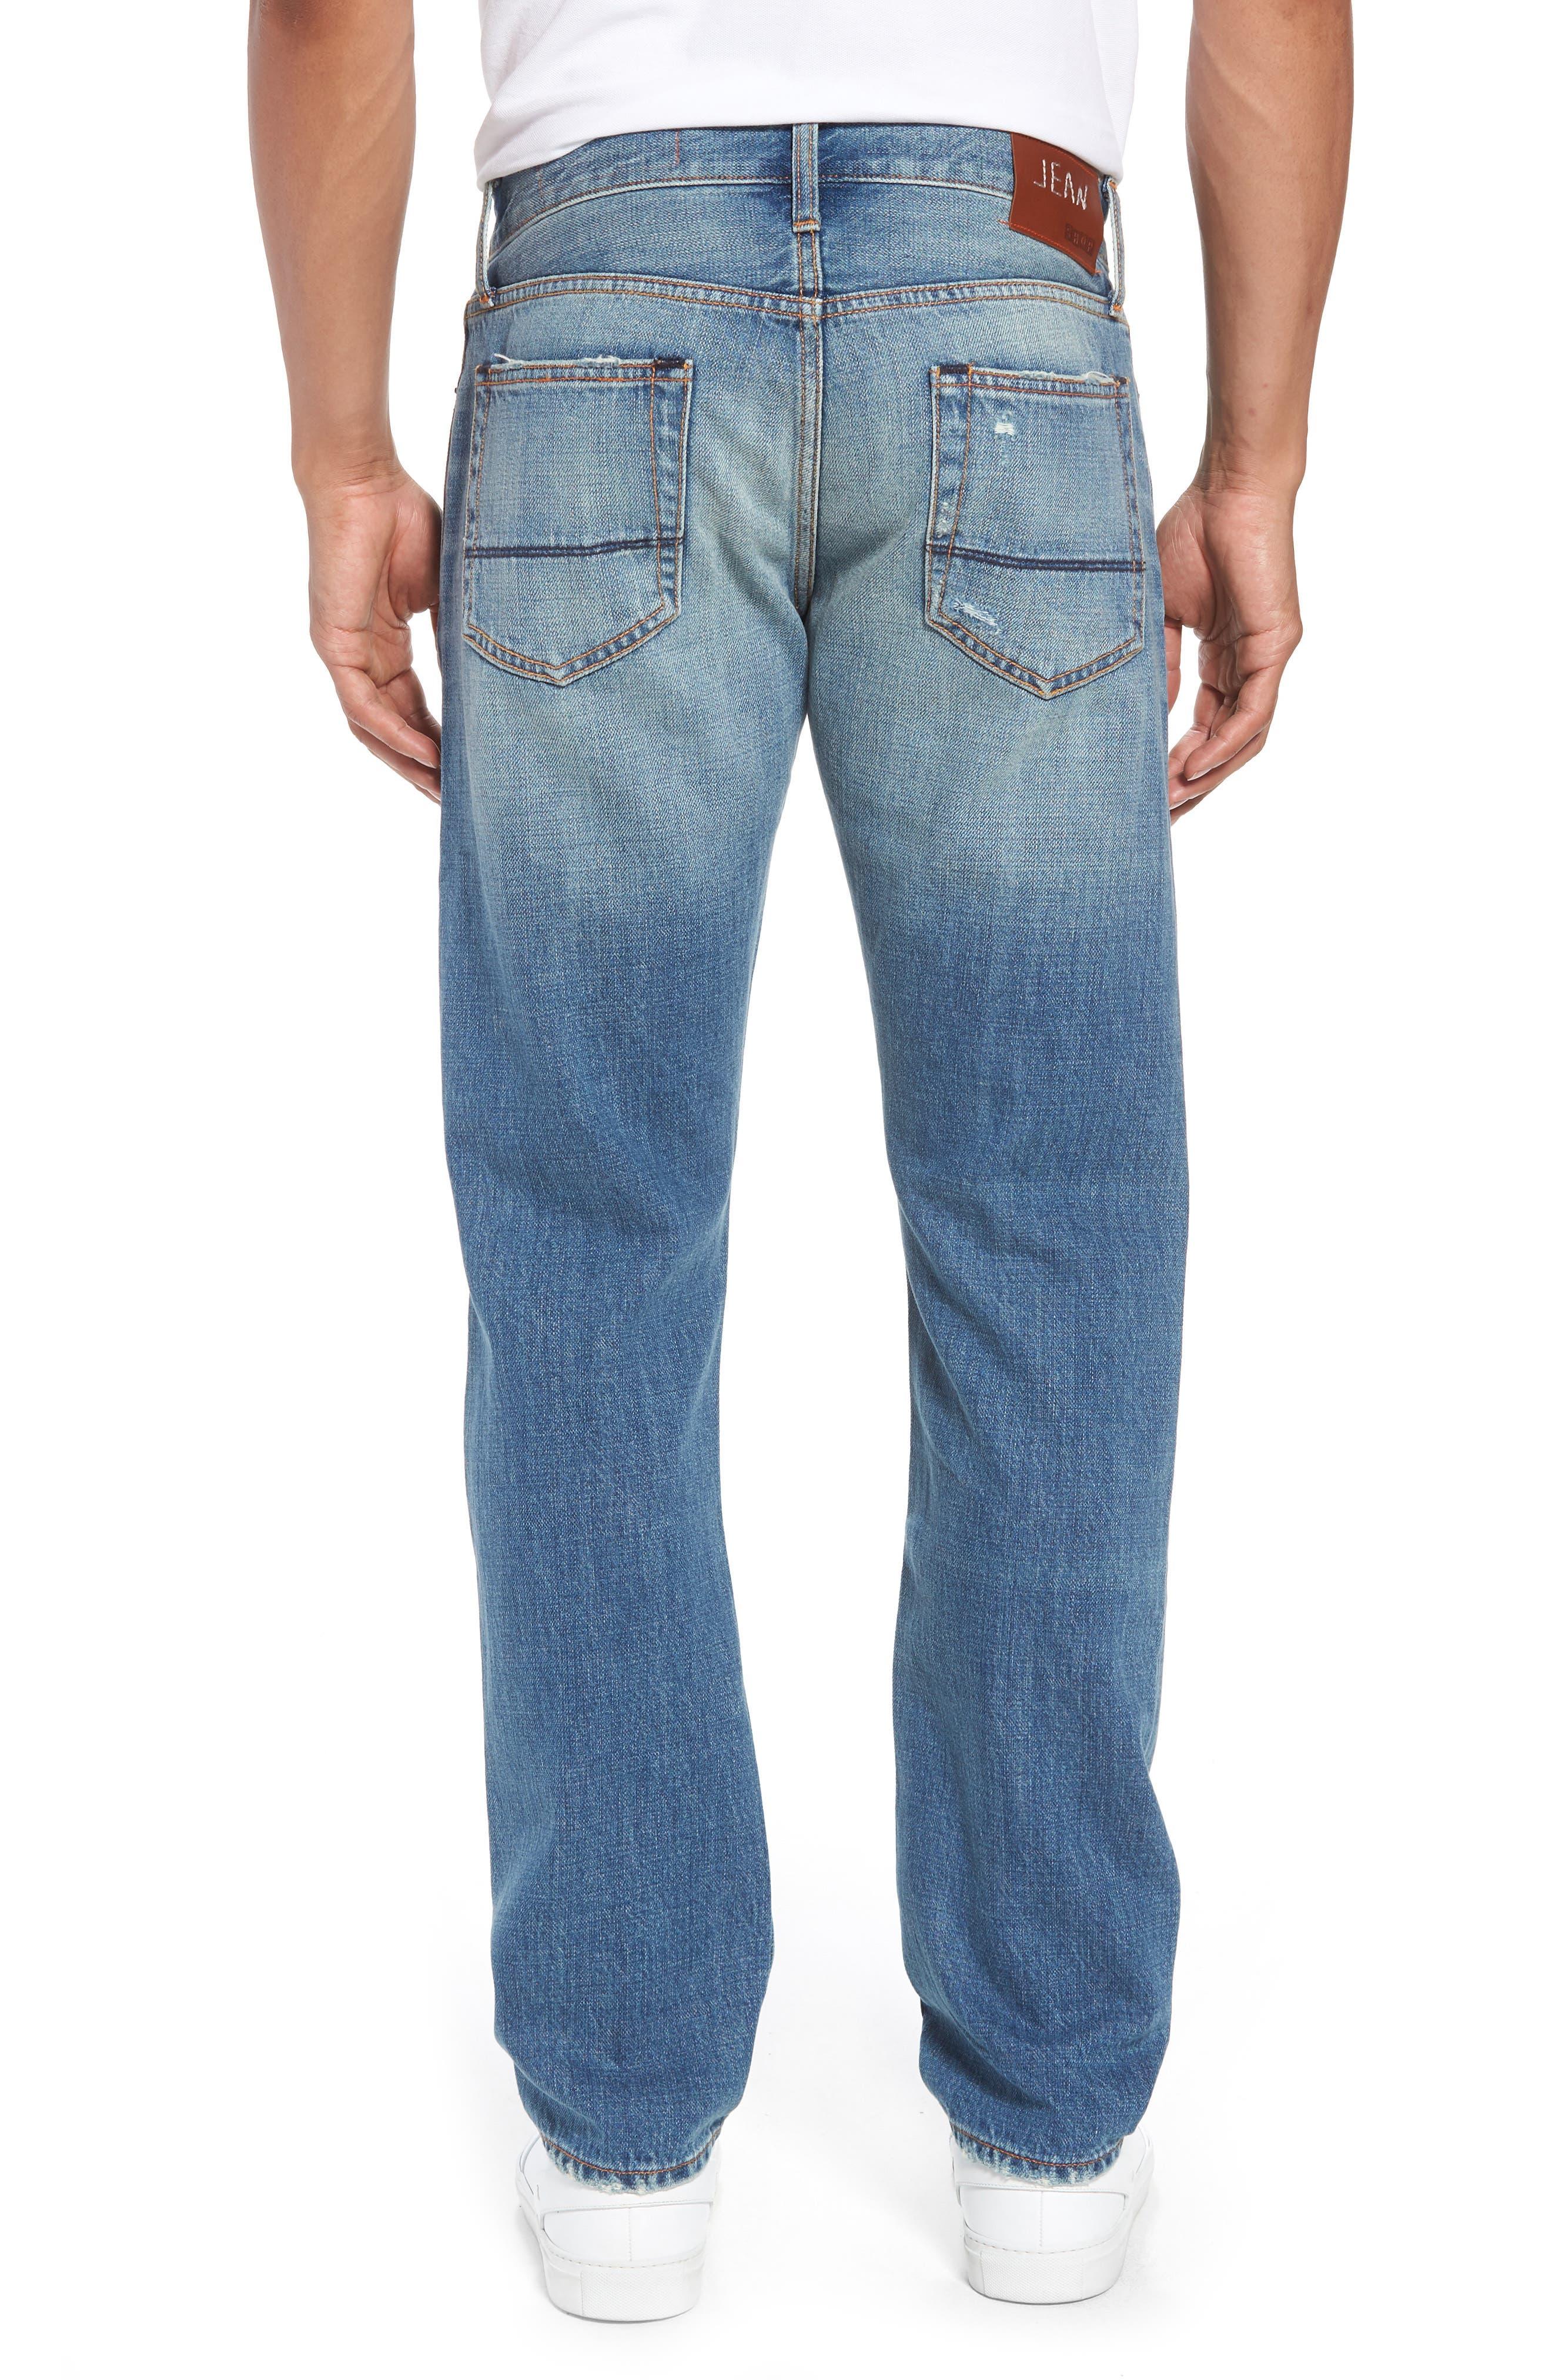 Mick Slim Straight Leg Jeans,                             Alternate thumbnail 2, color,                             ACCORD